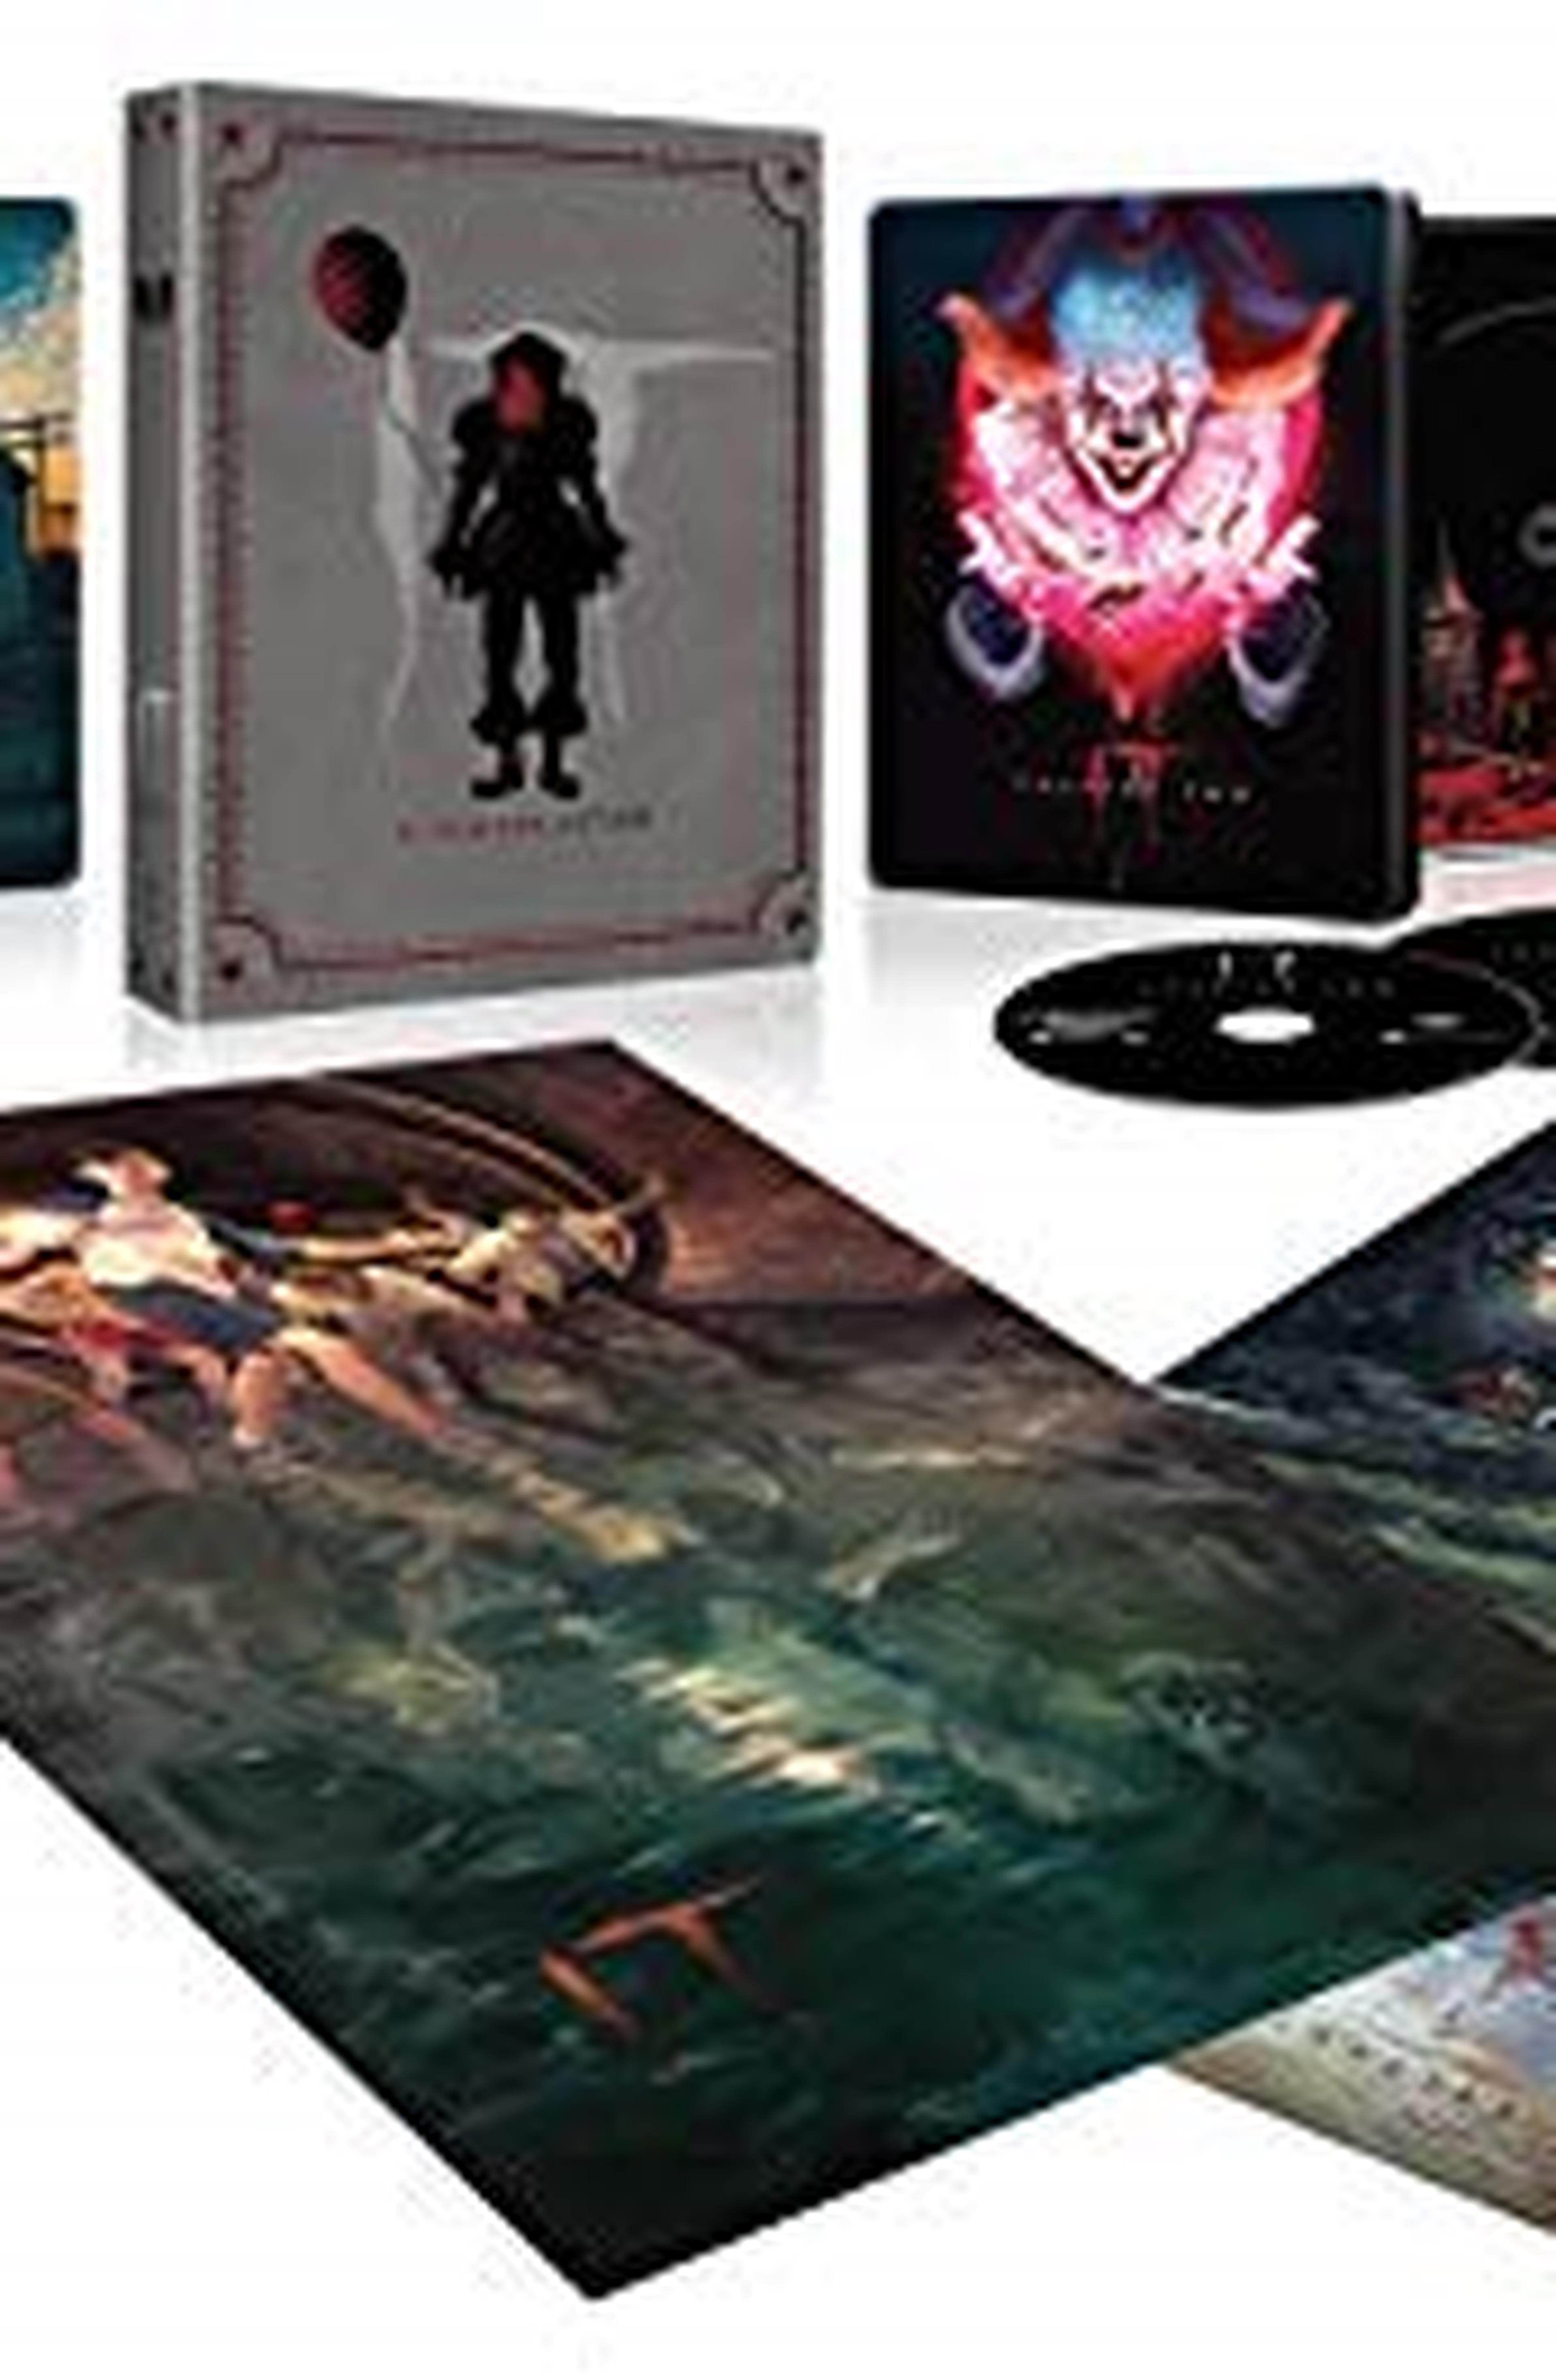 IT - 2 Film Collection - Steelbook Edition - 4K Ultra HD + Blu Ray (5 dischi)